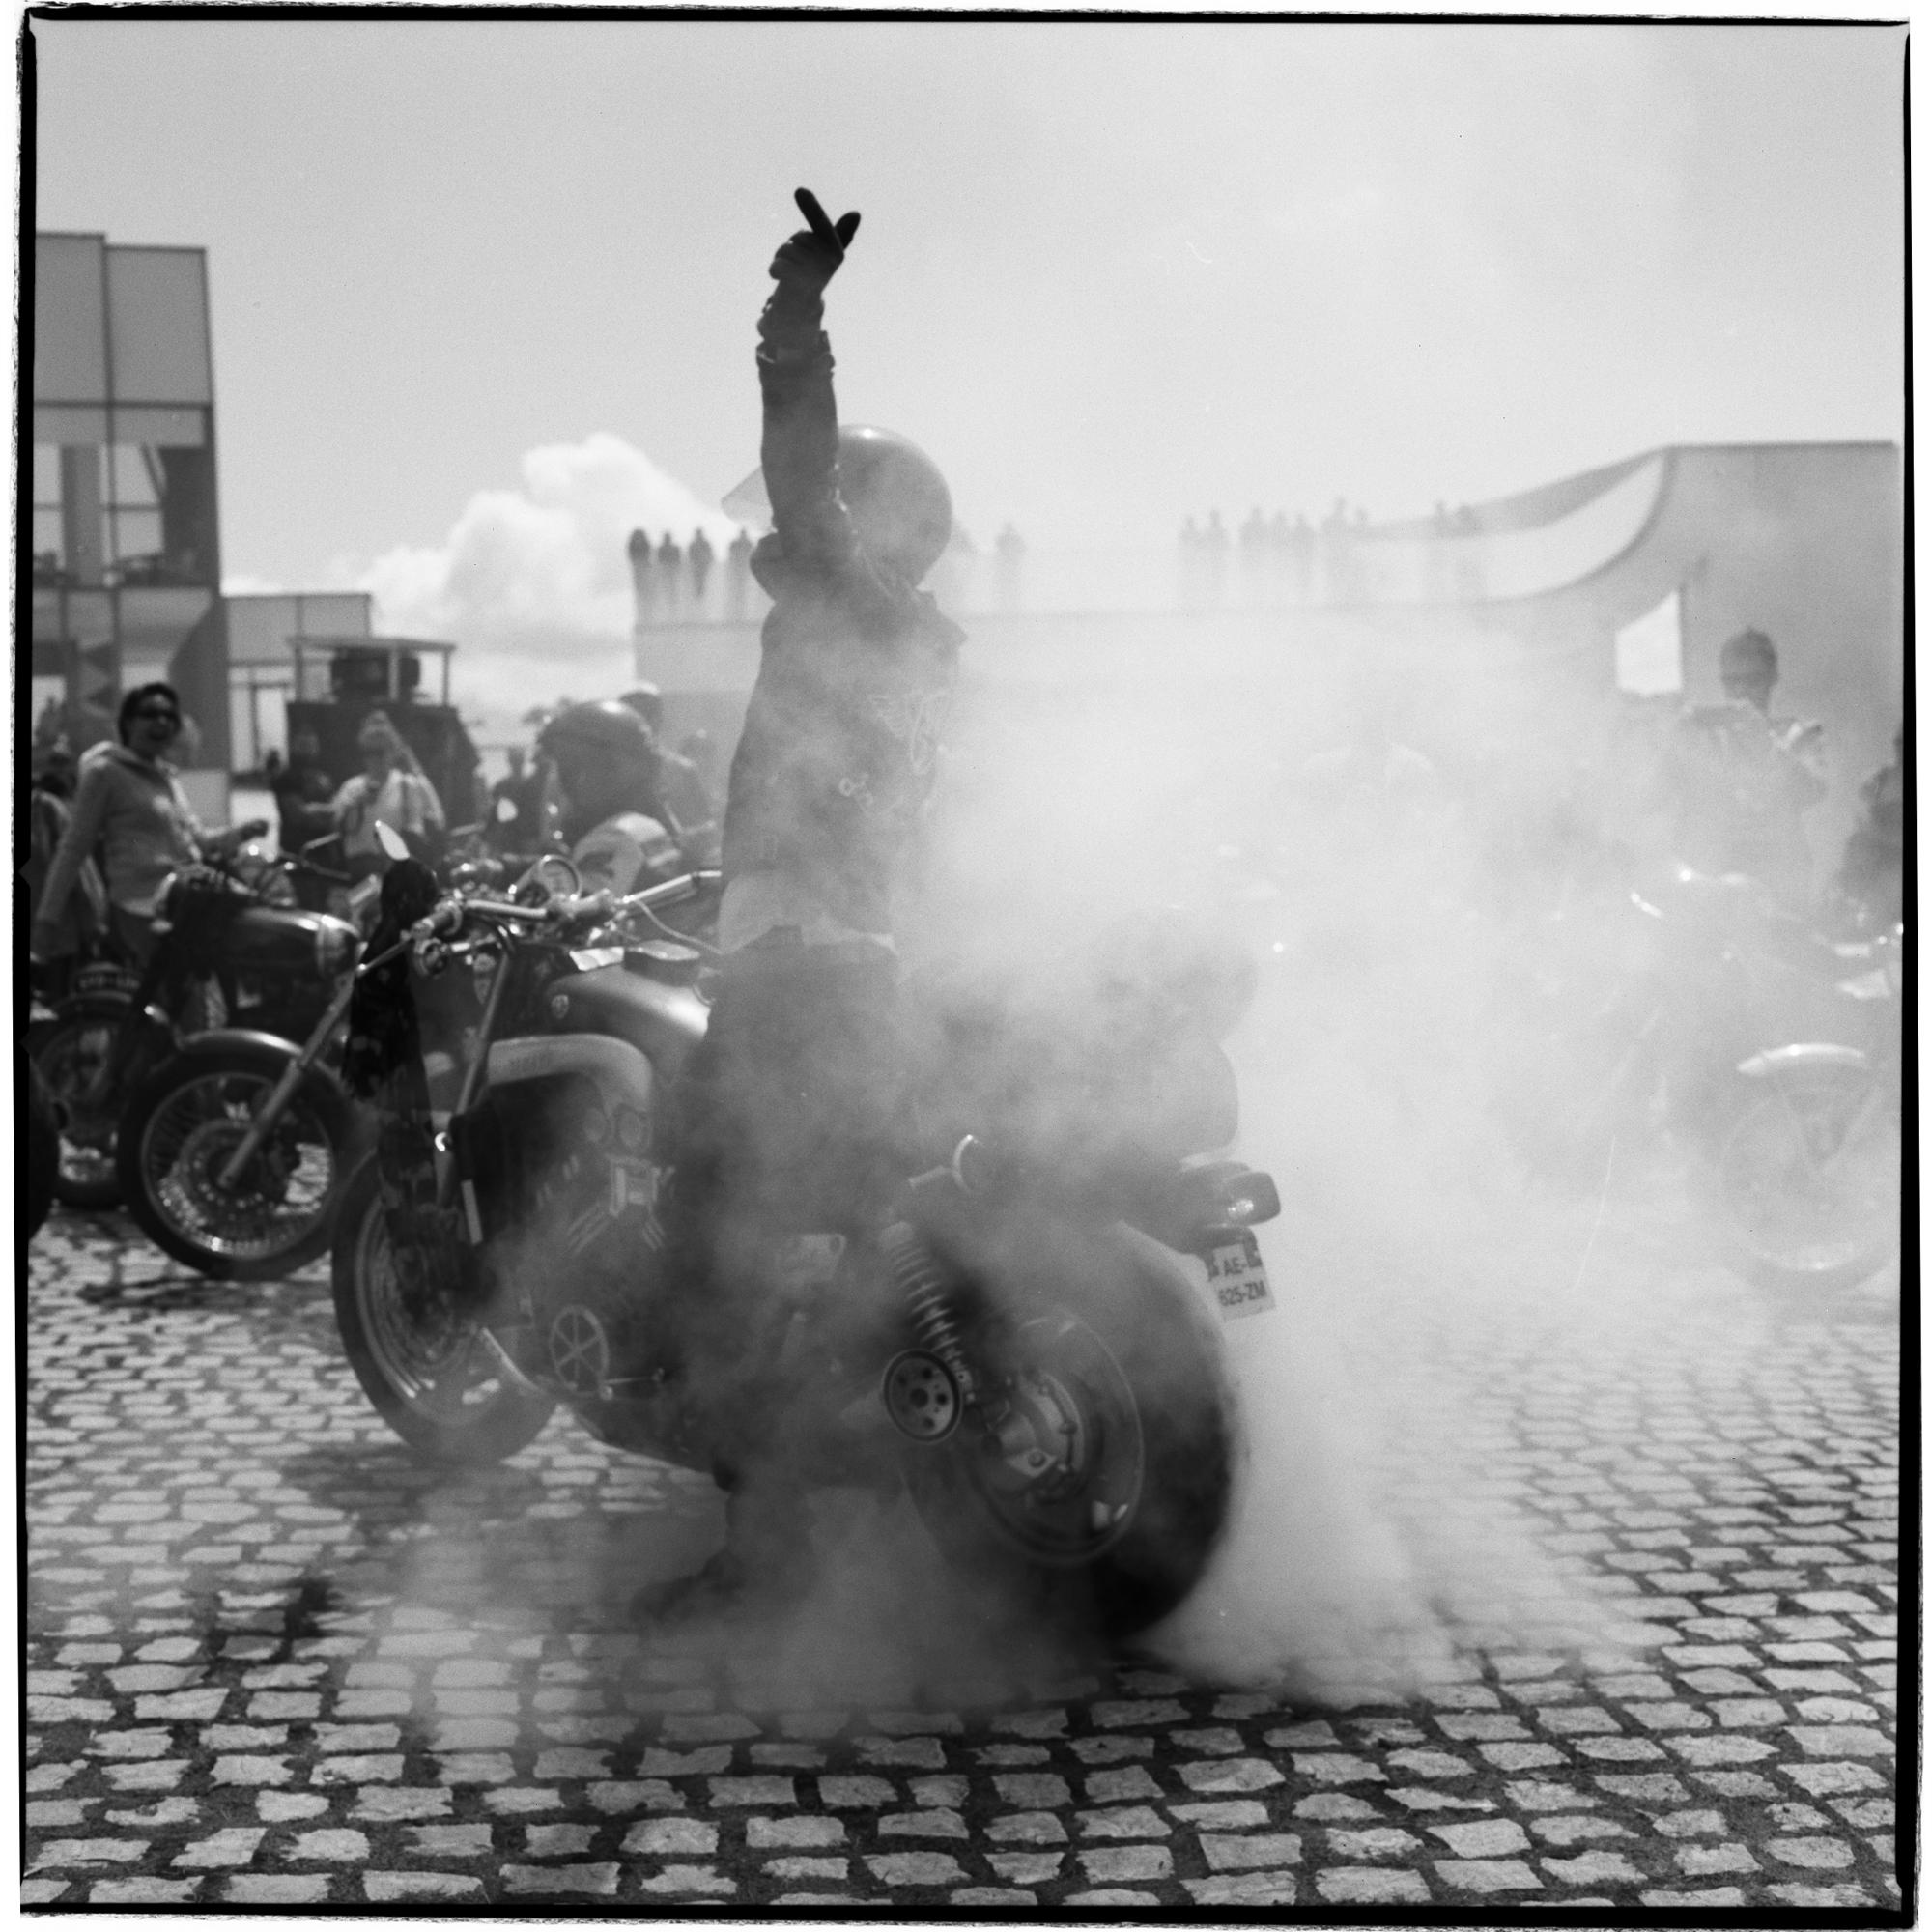 Grant Smith - Biker Salute